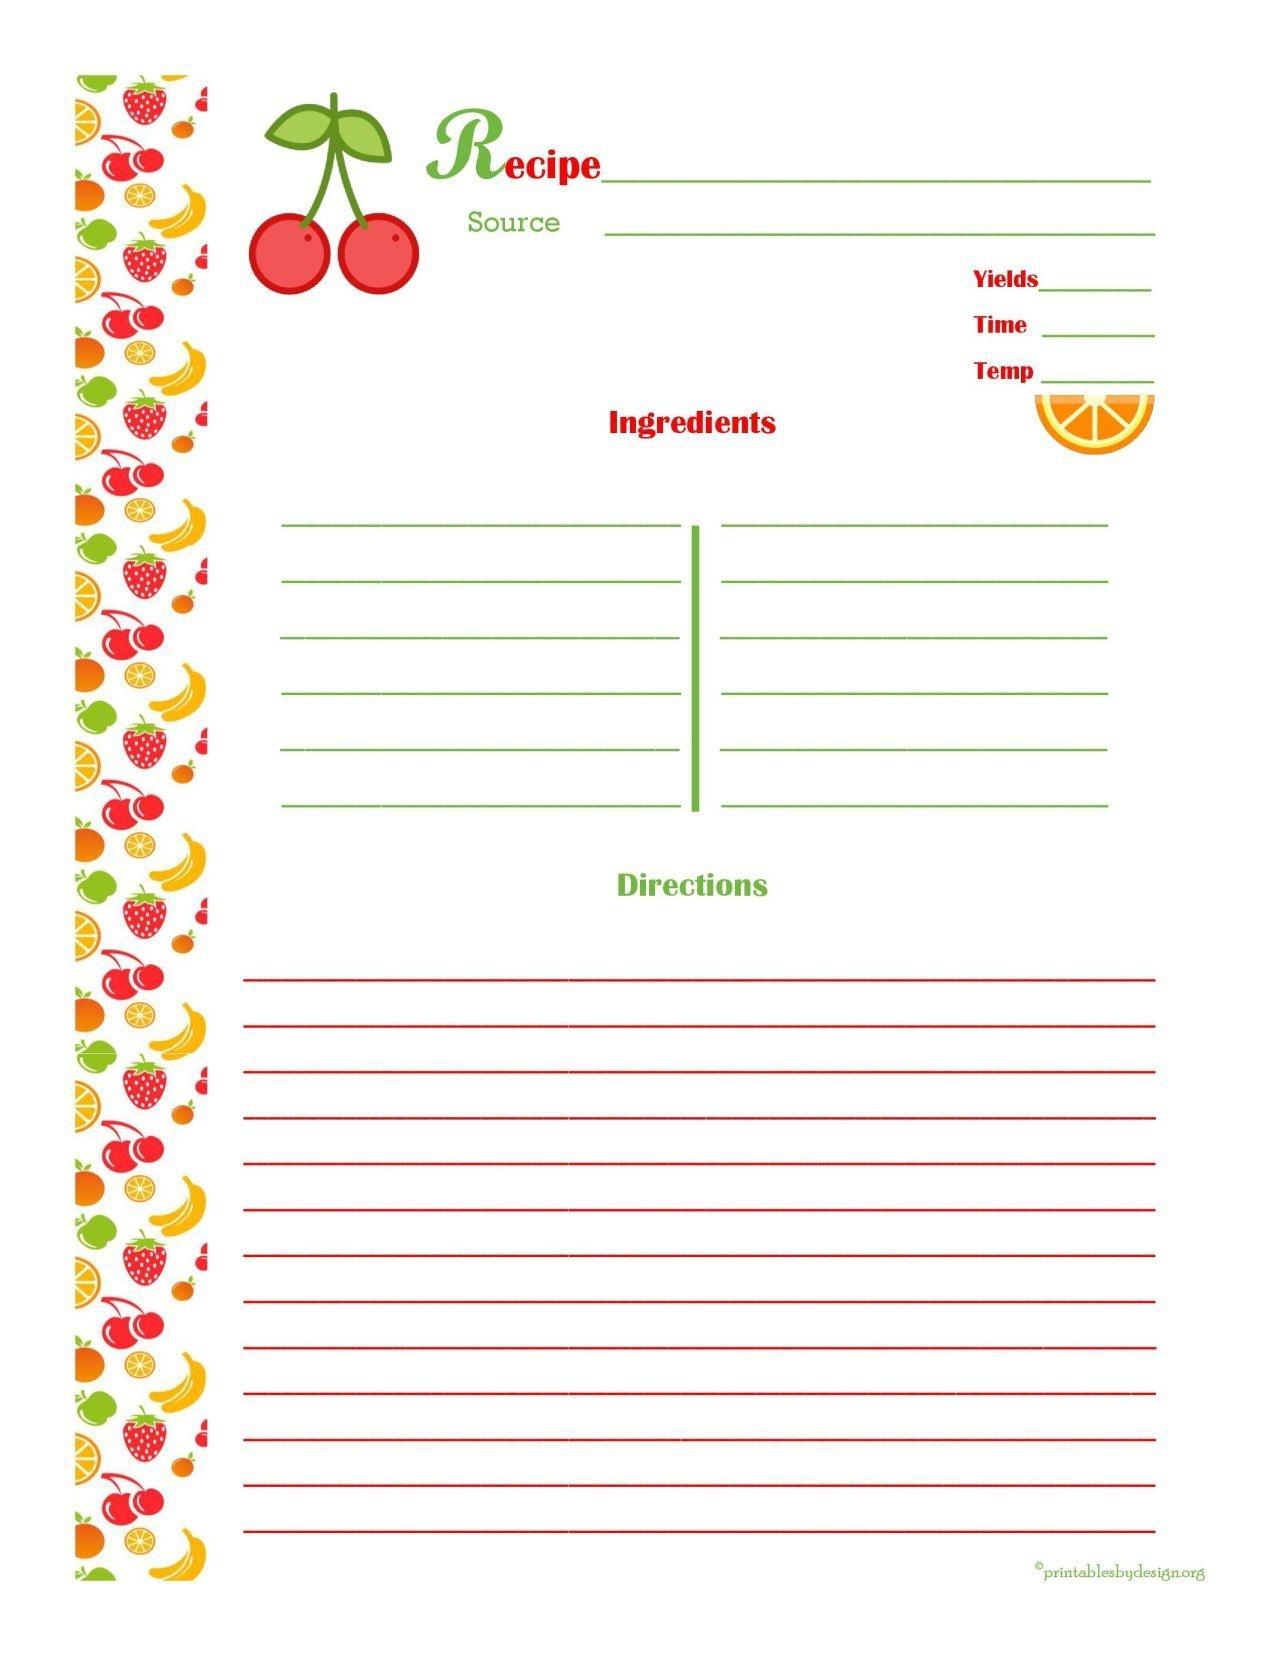 Free Editable Recipe Card Templates For Microsoft Word - Free - Free Printable Recipe Templates